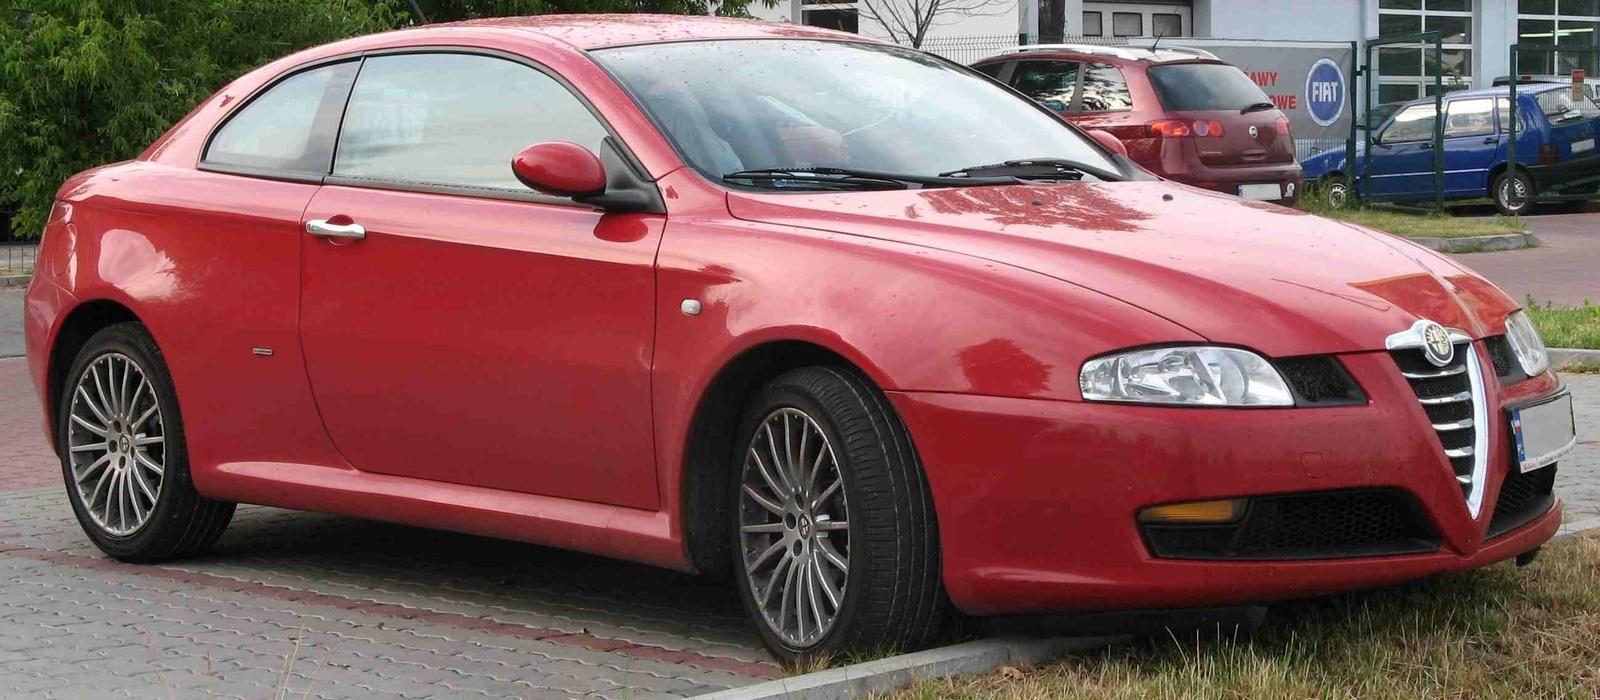 2000 Alfa Romeo 146 - Overview - CarGurus